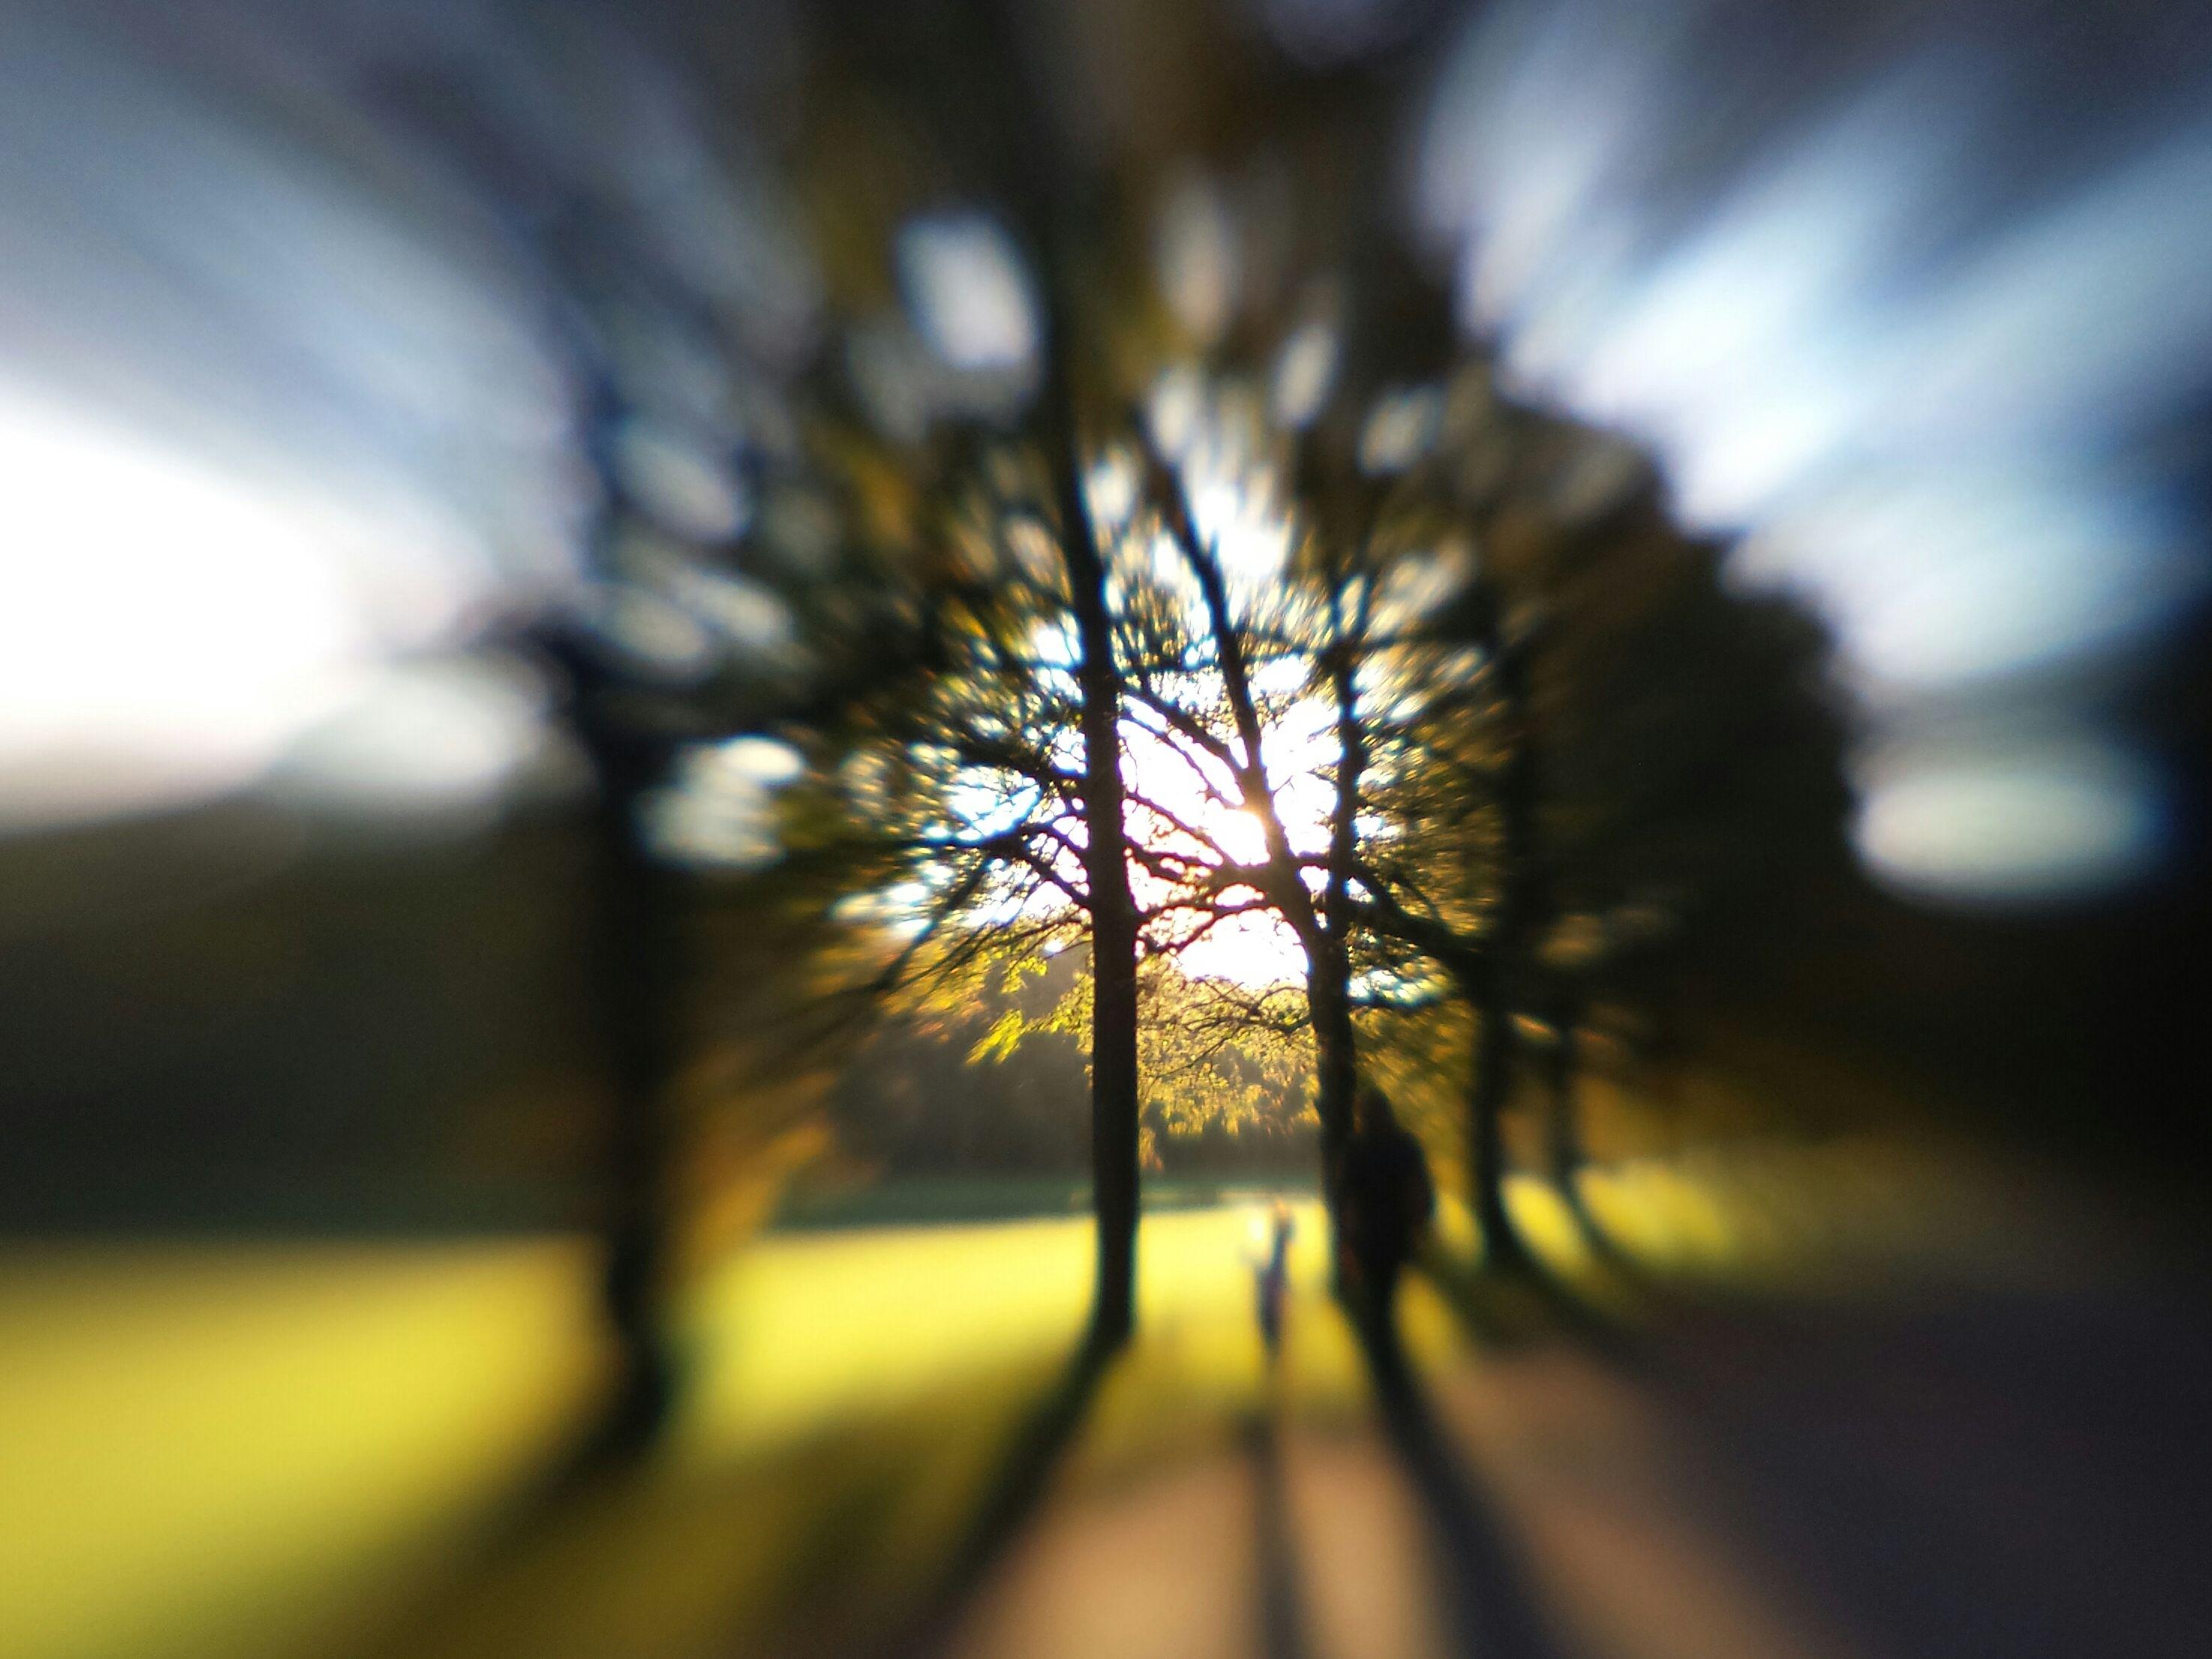 Aufnahme mit Lensbaby LM-10 Smartphone Objektiv  Produktinfos unter:  http://www.hapa-team.de/SMARTPHONE-ZUBEHOeR/Objektive-und-Filter/Lensbaby-Sweet-Spot-Lens-LM-10::8168.html  #lensbaby #hapateam